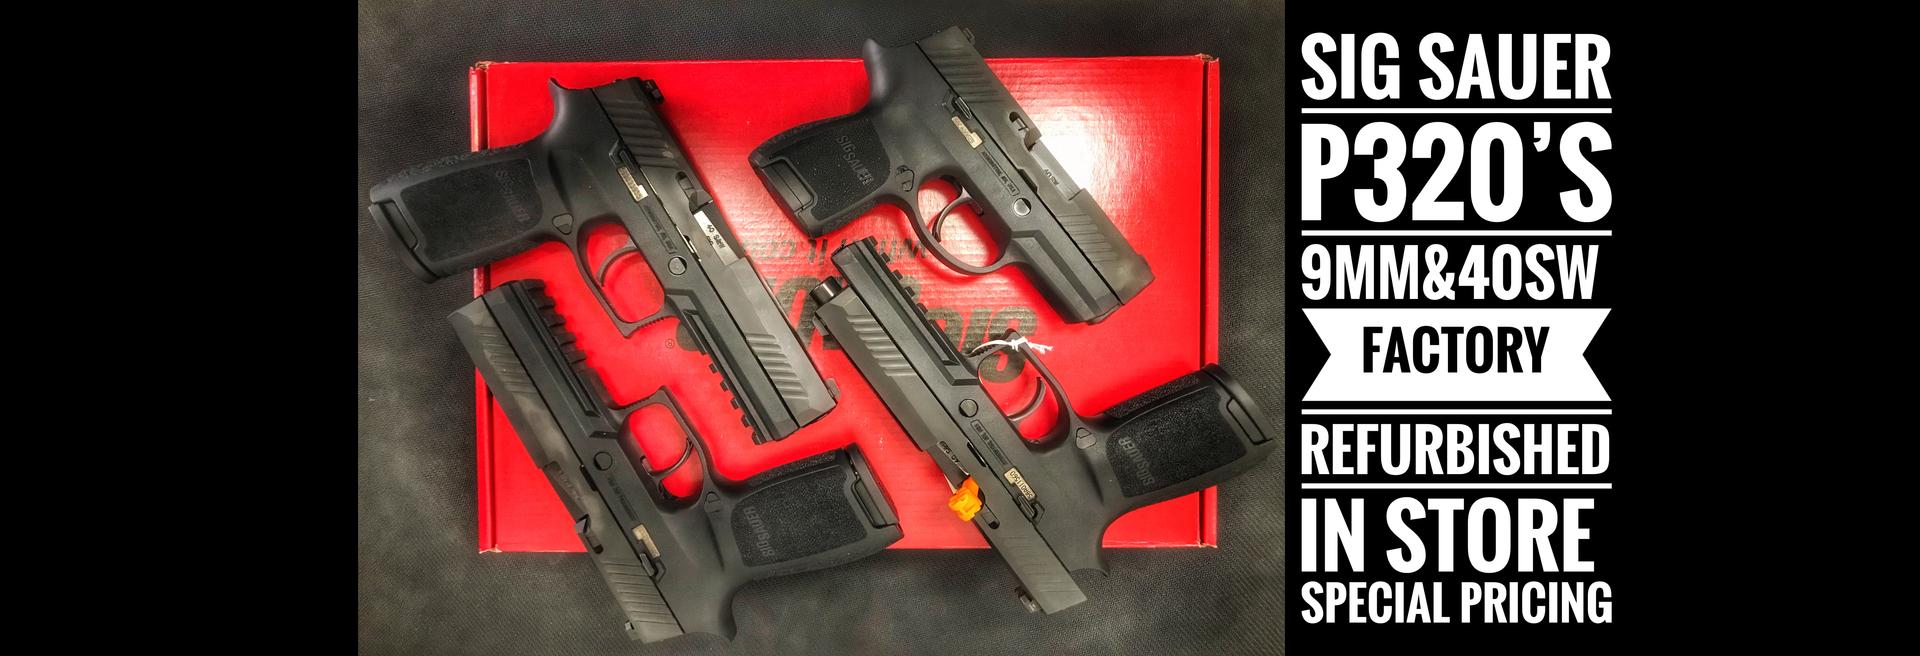 Maryland Gun Shop, Firearm FFL Dealer, Gun Sales Eastern Shore